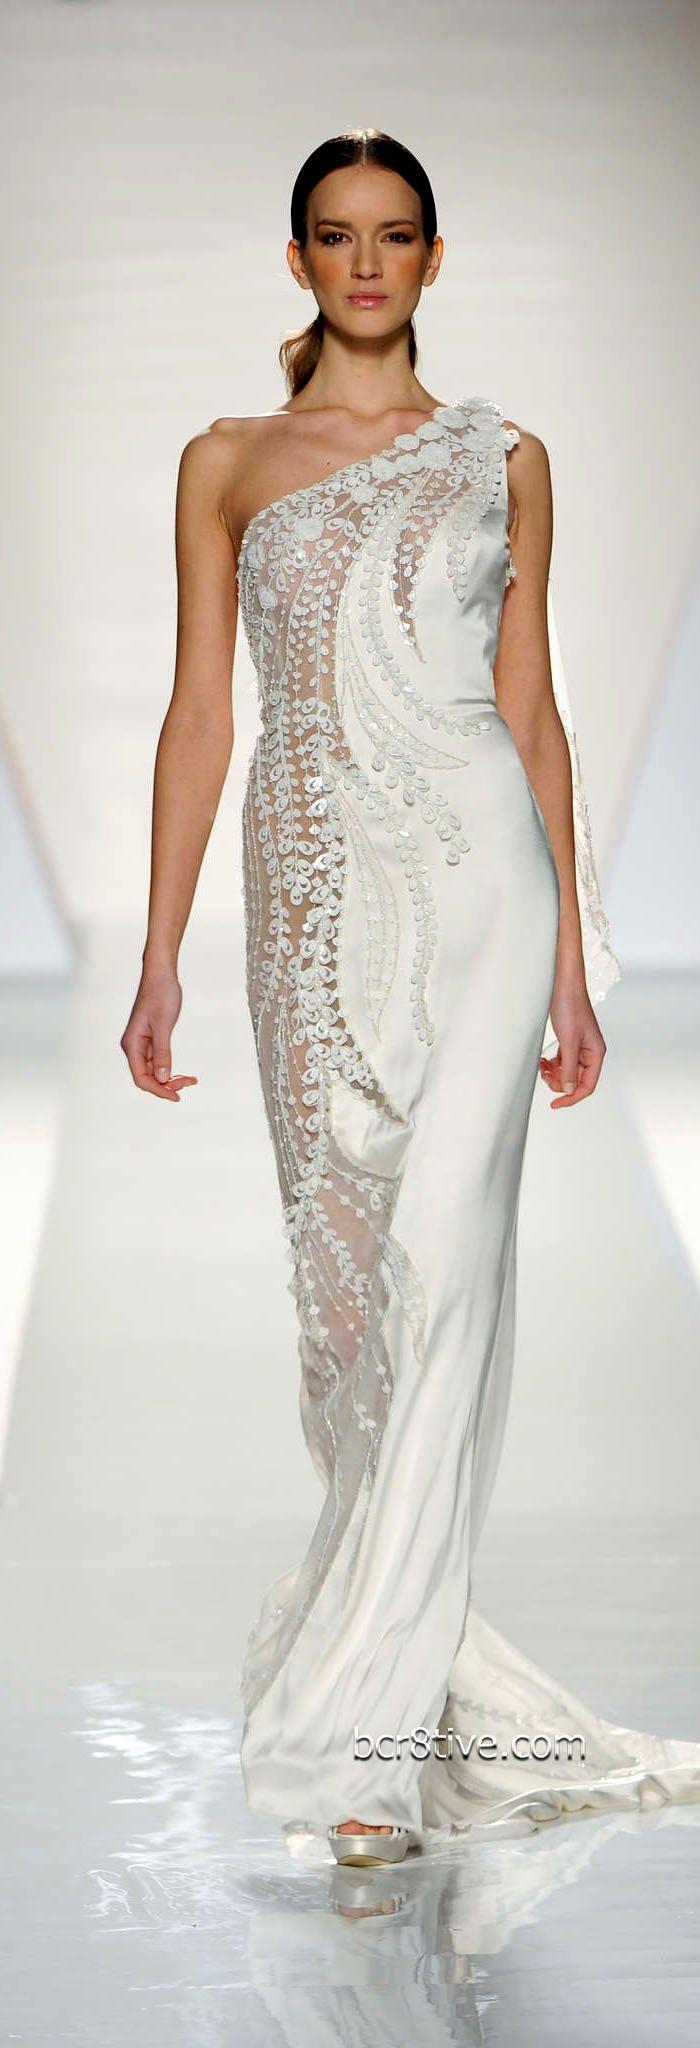 ✪ Fausto Sarli Spring Summer 2012 Couture ✪